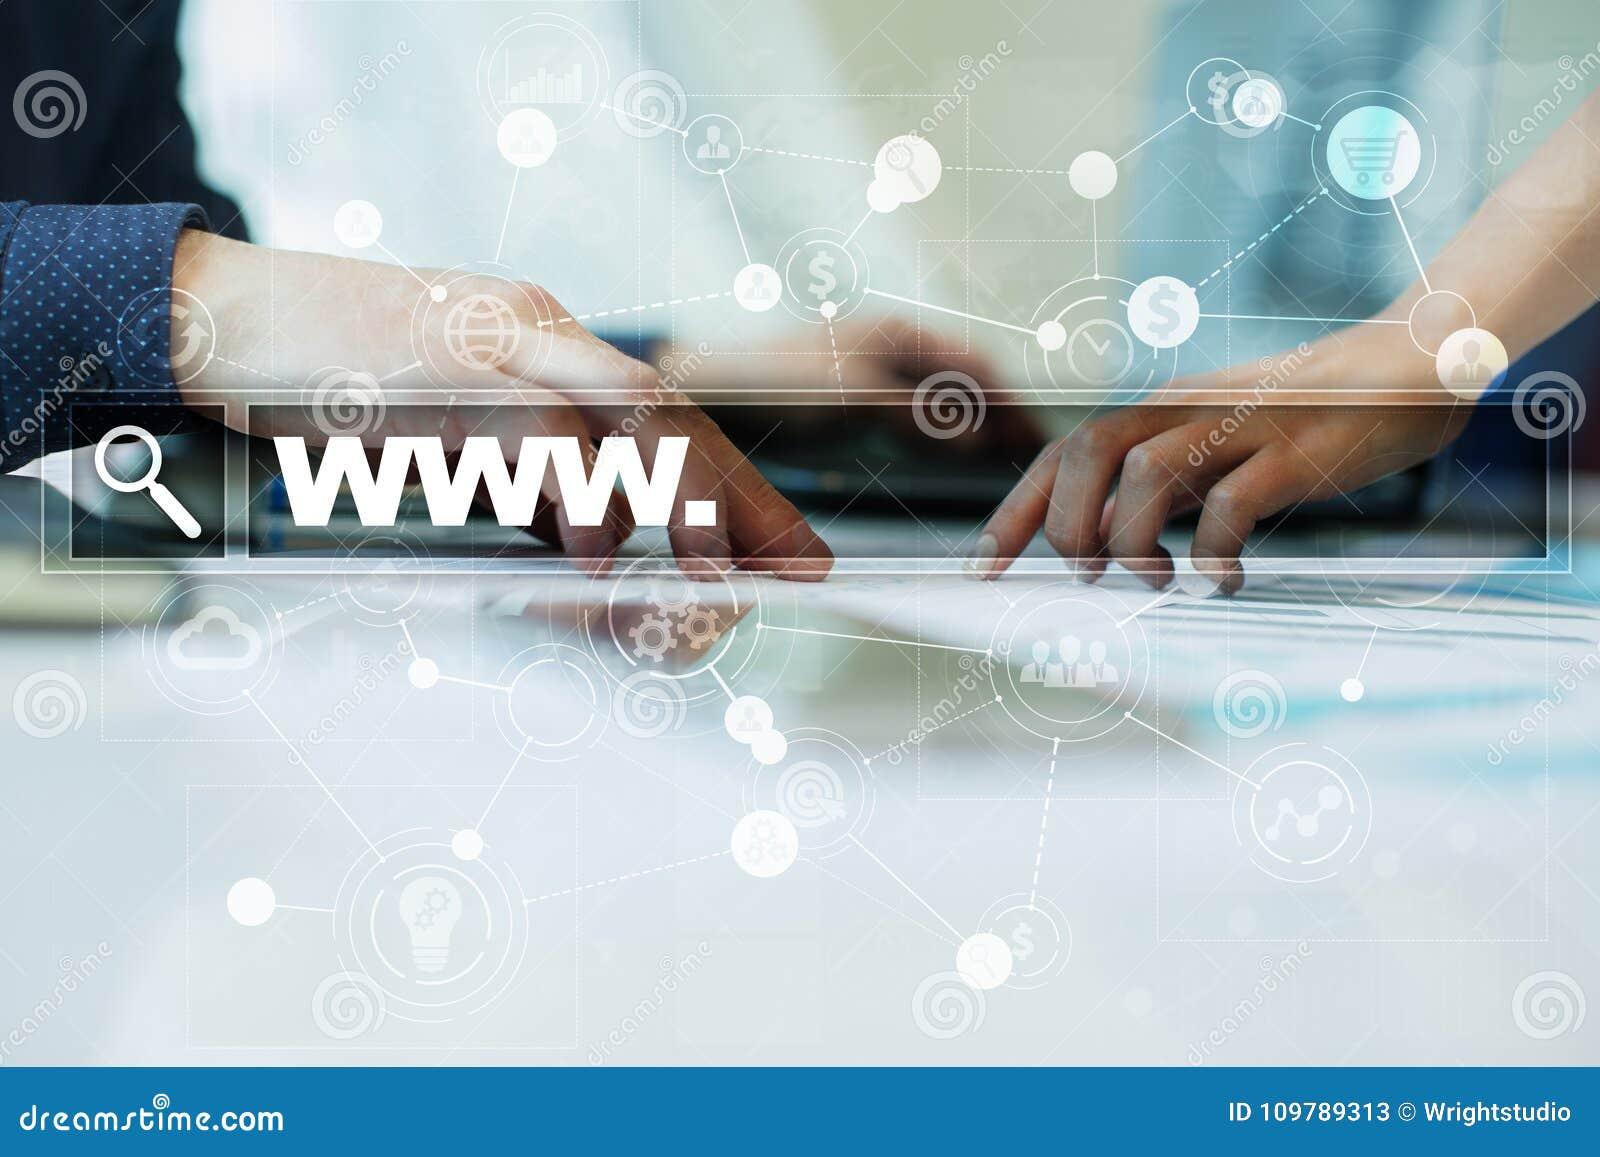 Onderzoeksbar met wwwtekst Website, URL Digitale Marketing Zaken, Internet en technologieconcept